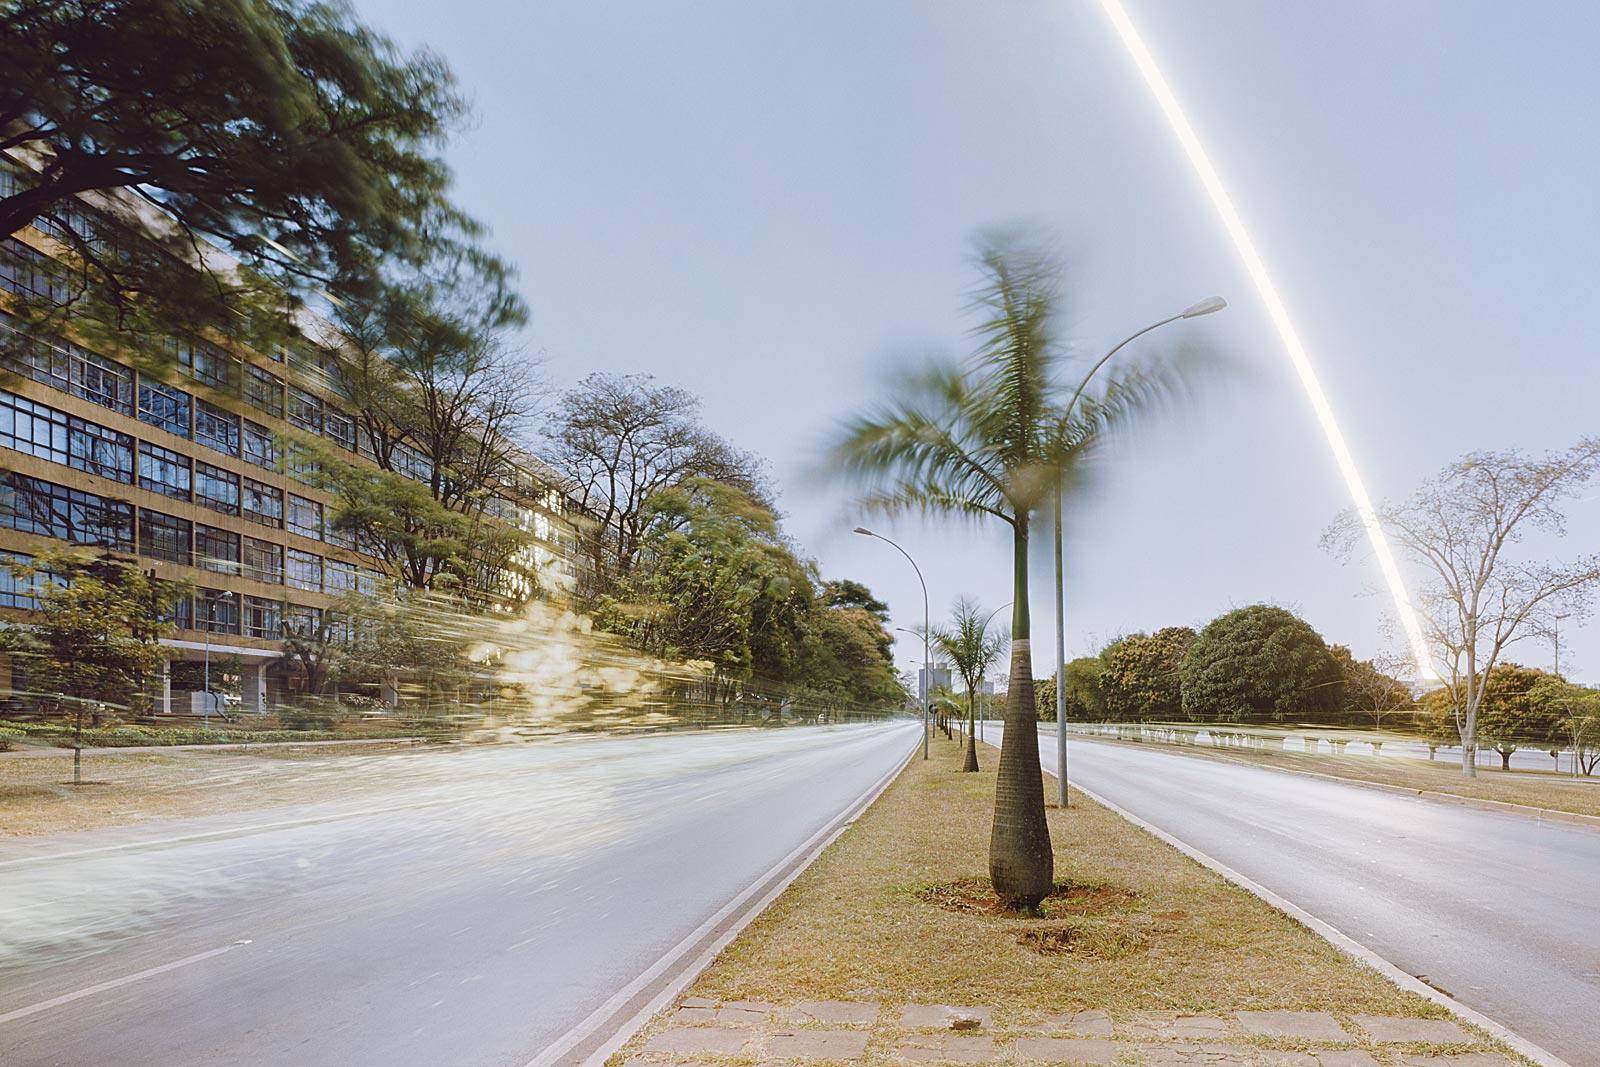 Eixo Rodoviário, Brasilia